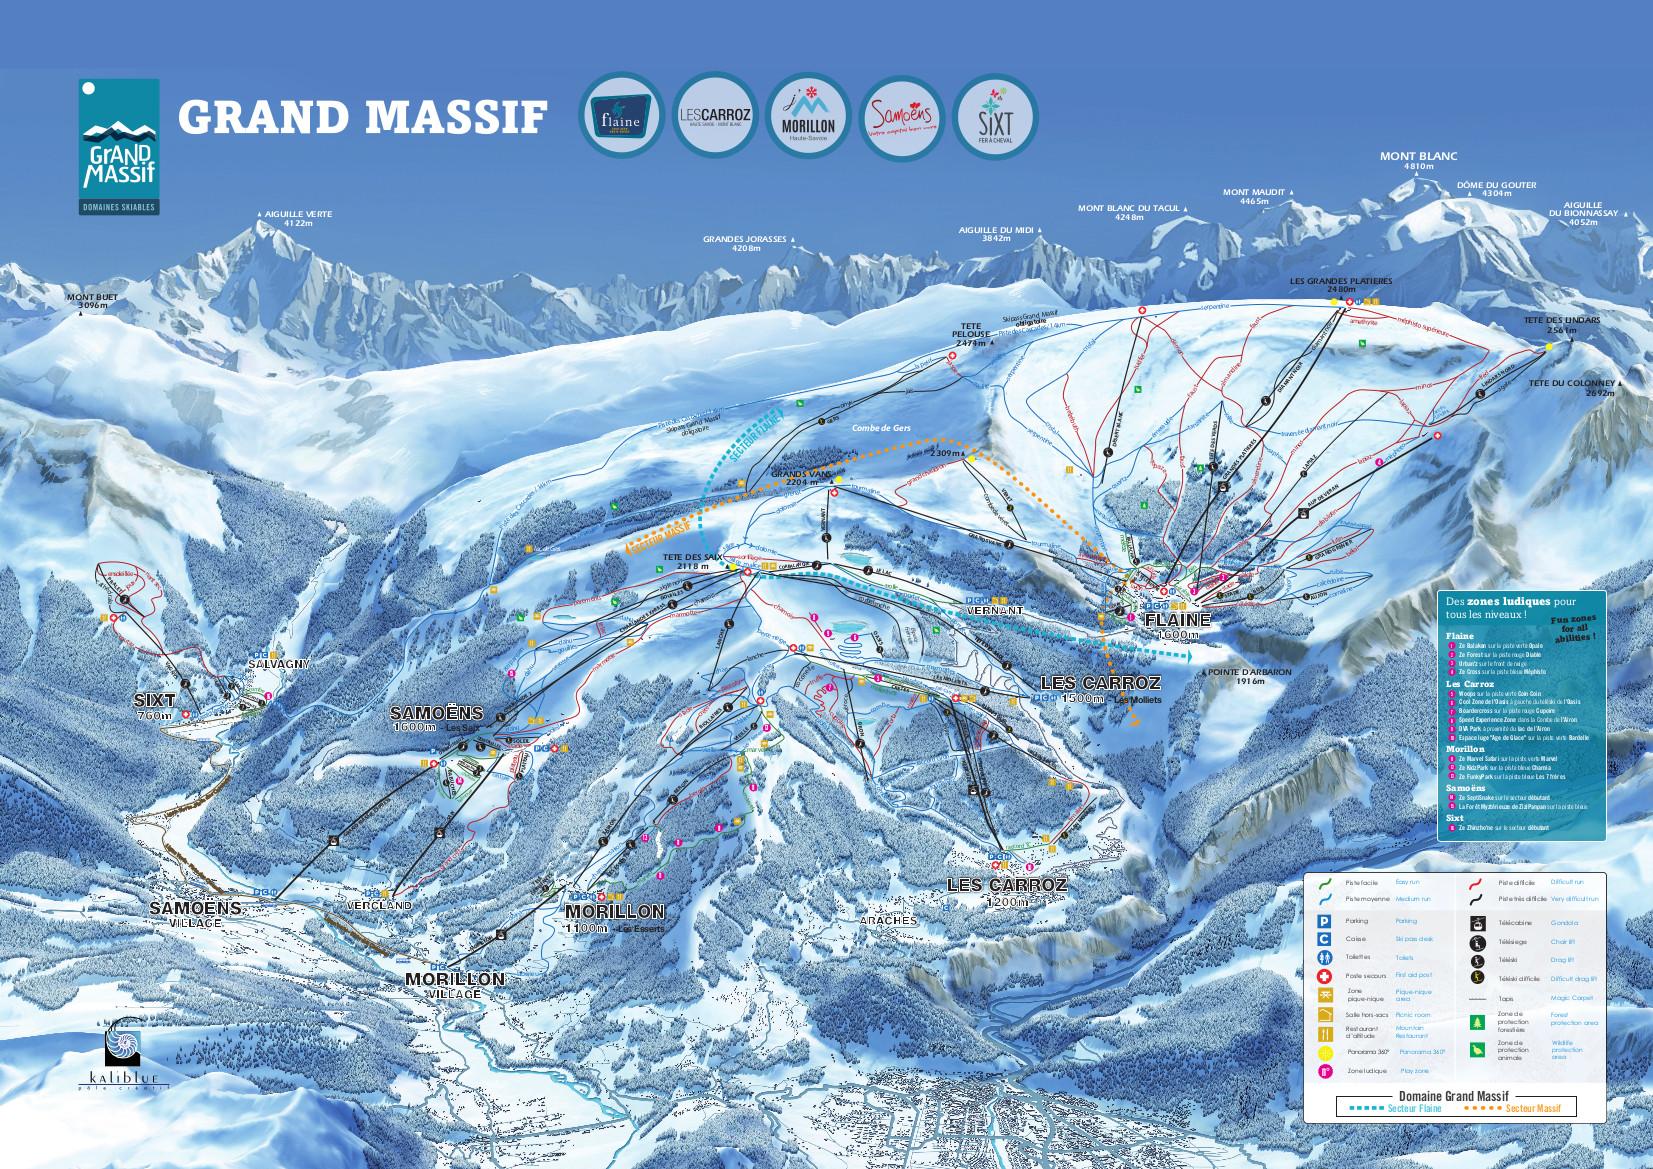 le grand massif piste map  u2013 free downloadable piste maps